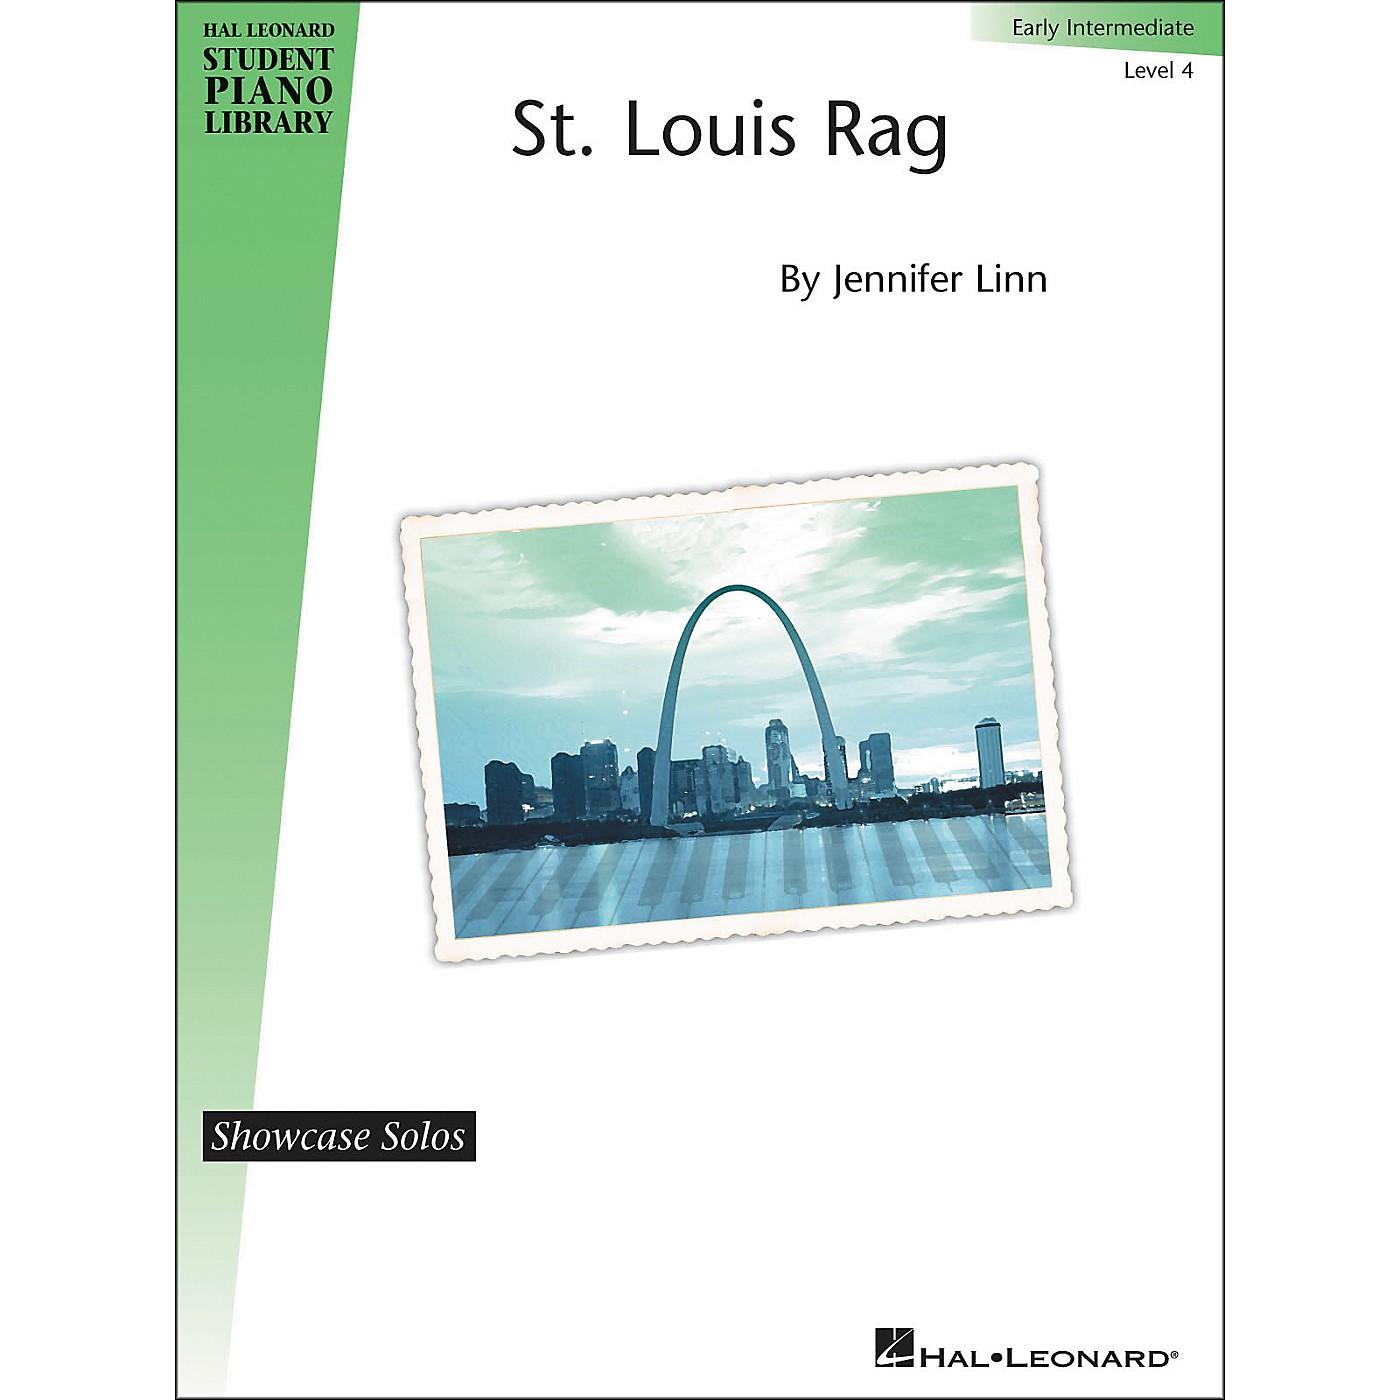 Hal Leonard St. Louis Rag - Showcase Solo Level 4 Early Intermediate Hal Leonard Student Piano Library by Jennifer Linn thumbnail